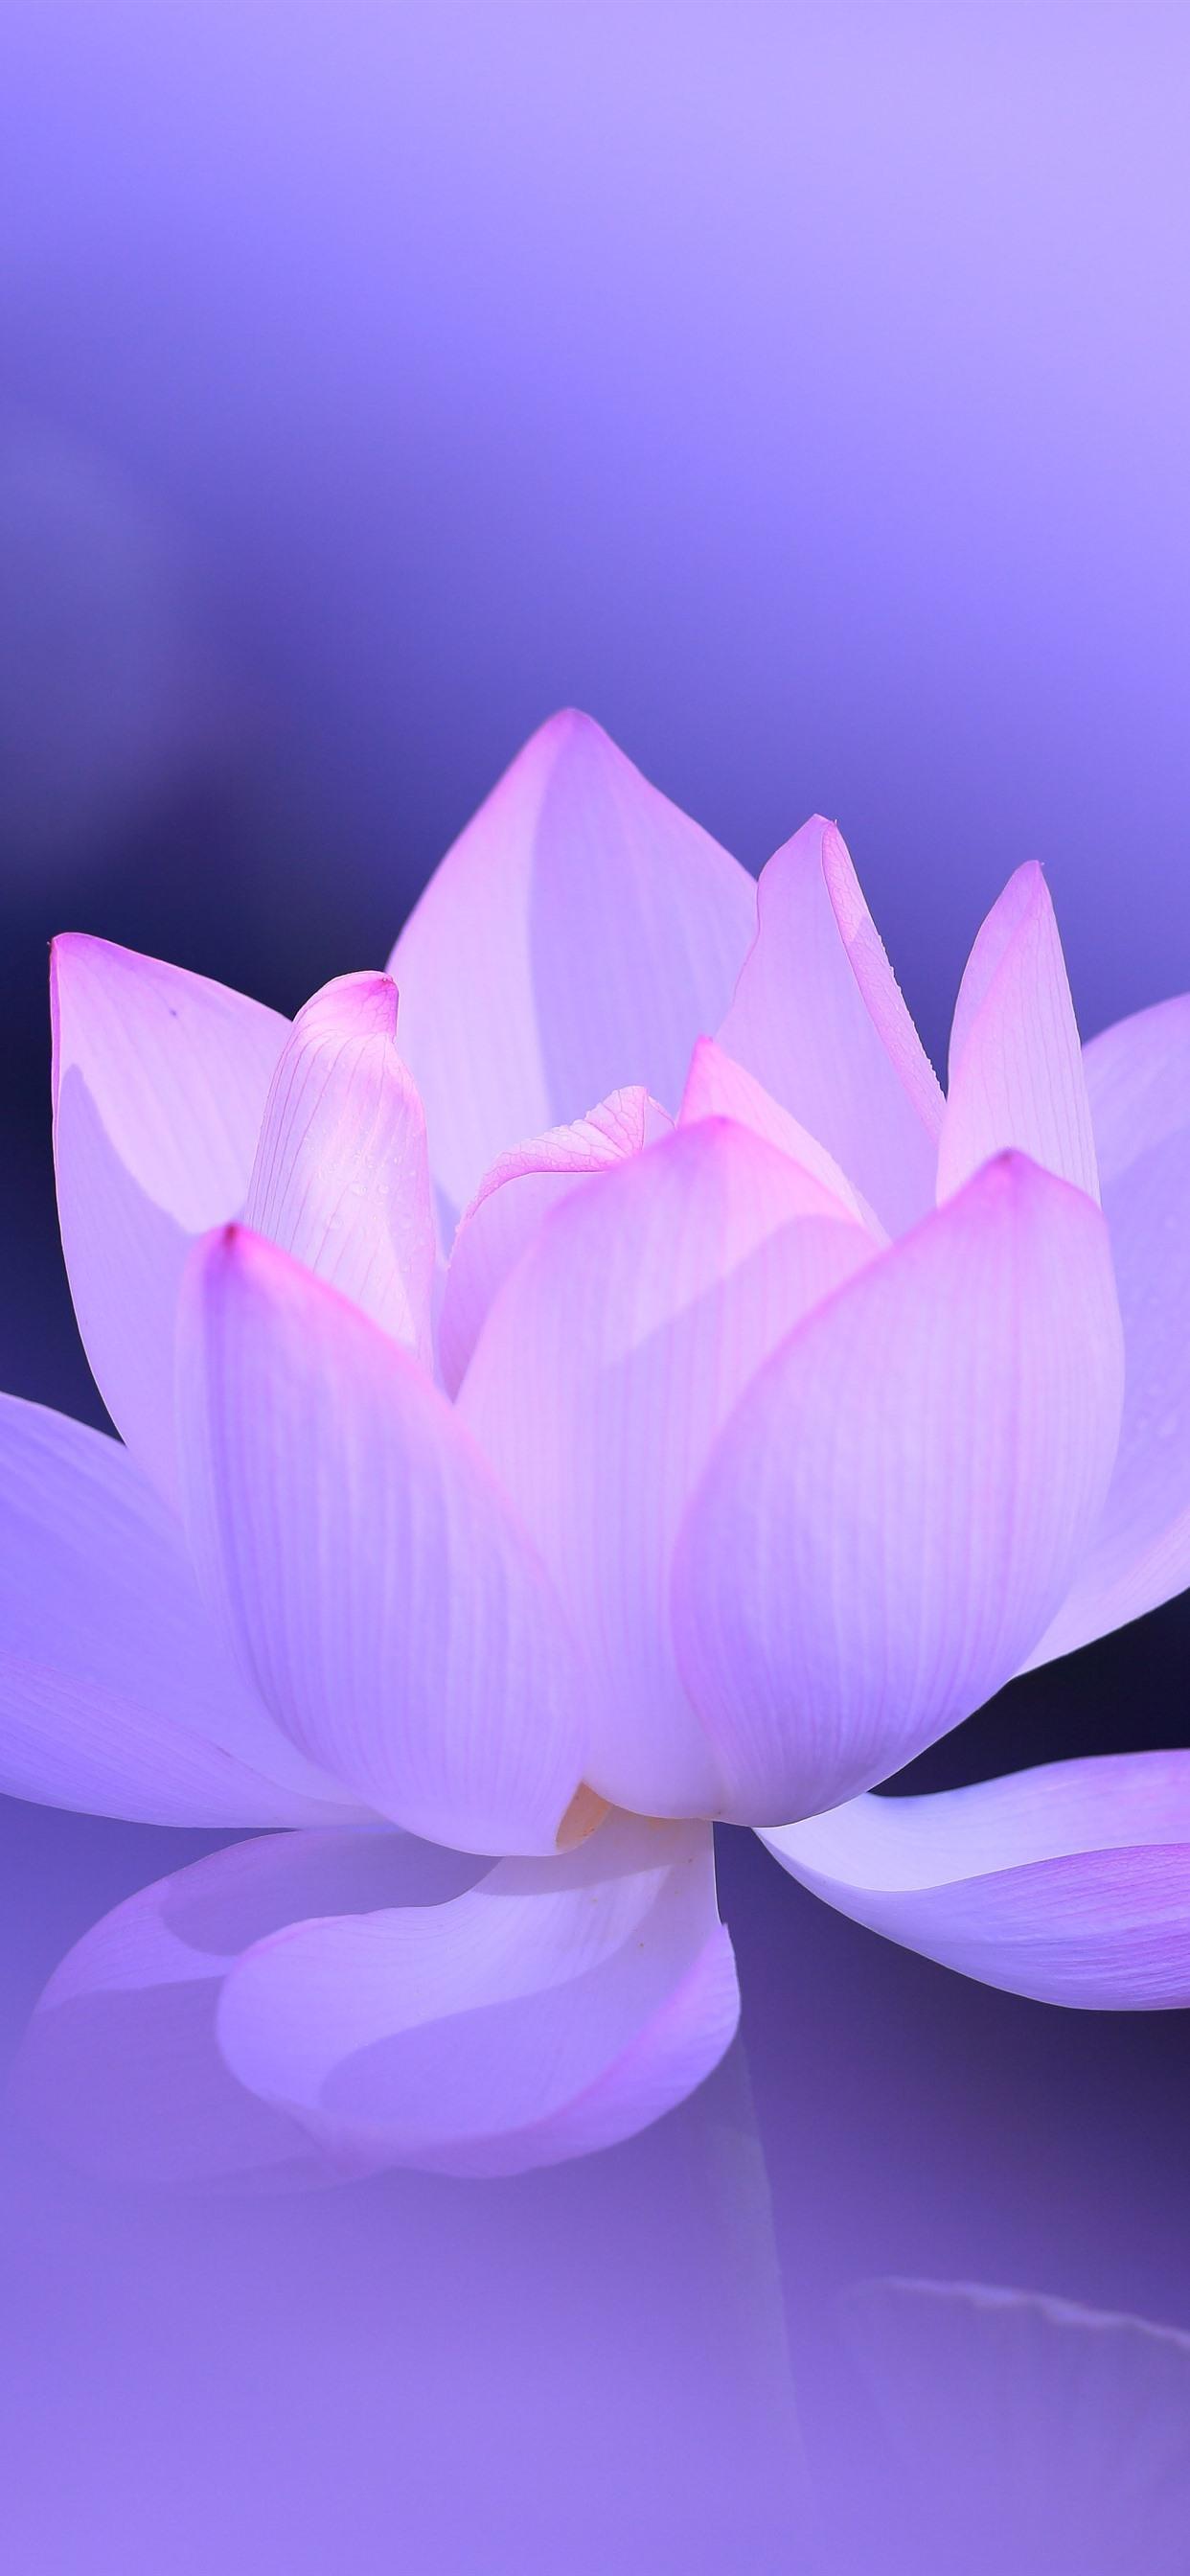 Pink Lotus Petals Purple Background Hazy Beautiful Flower